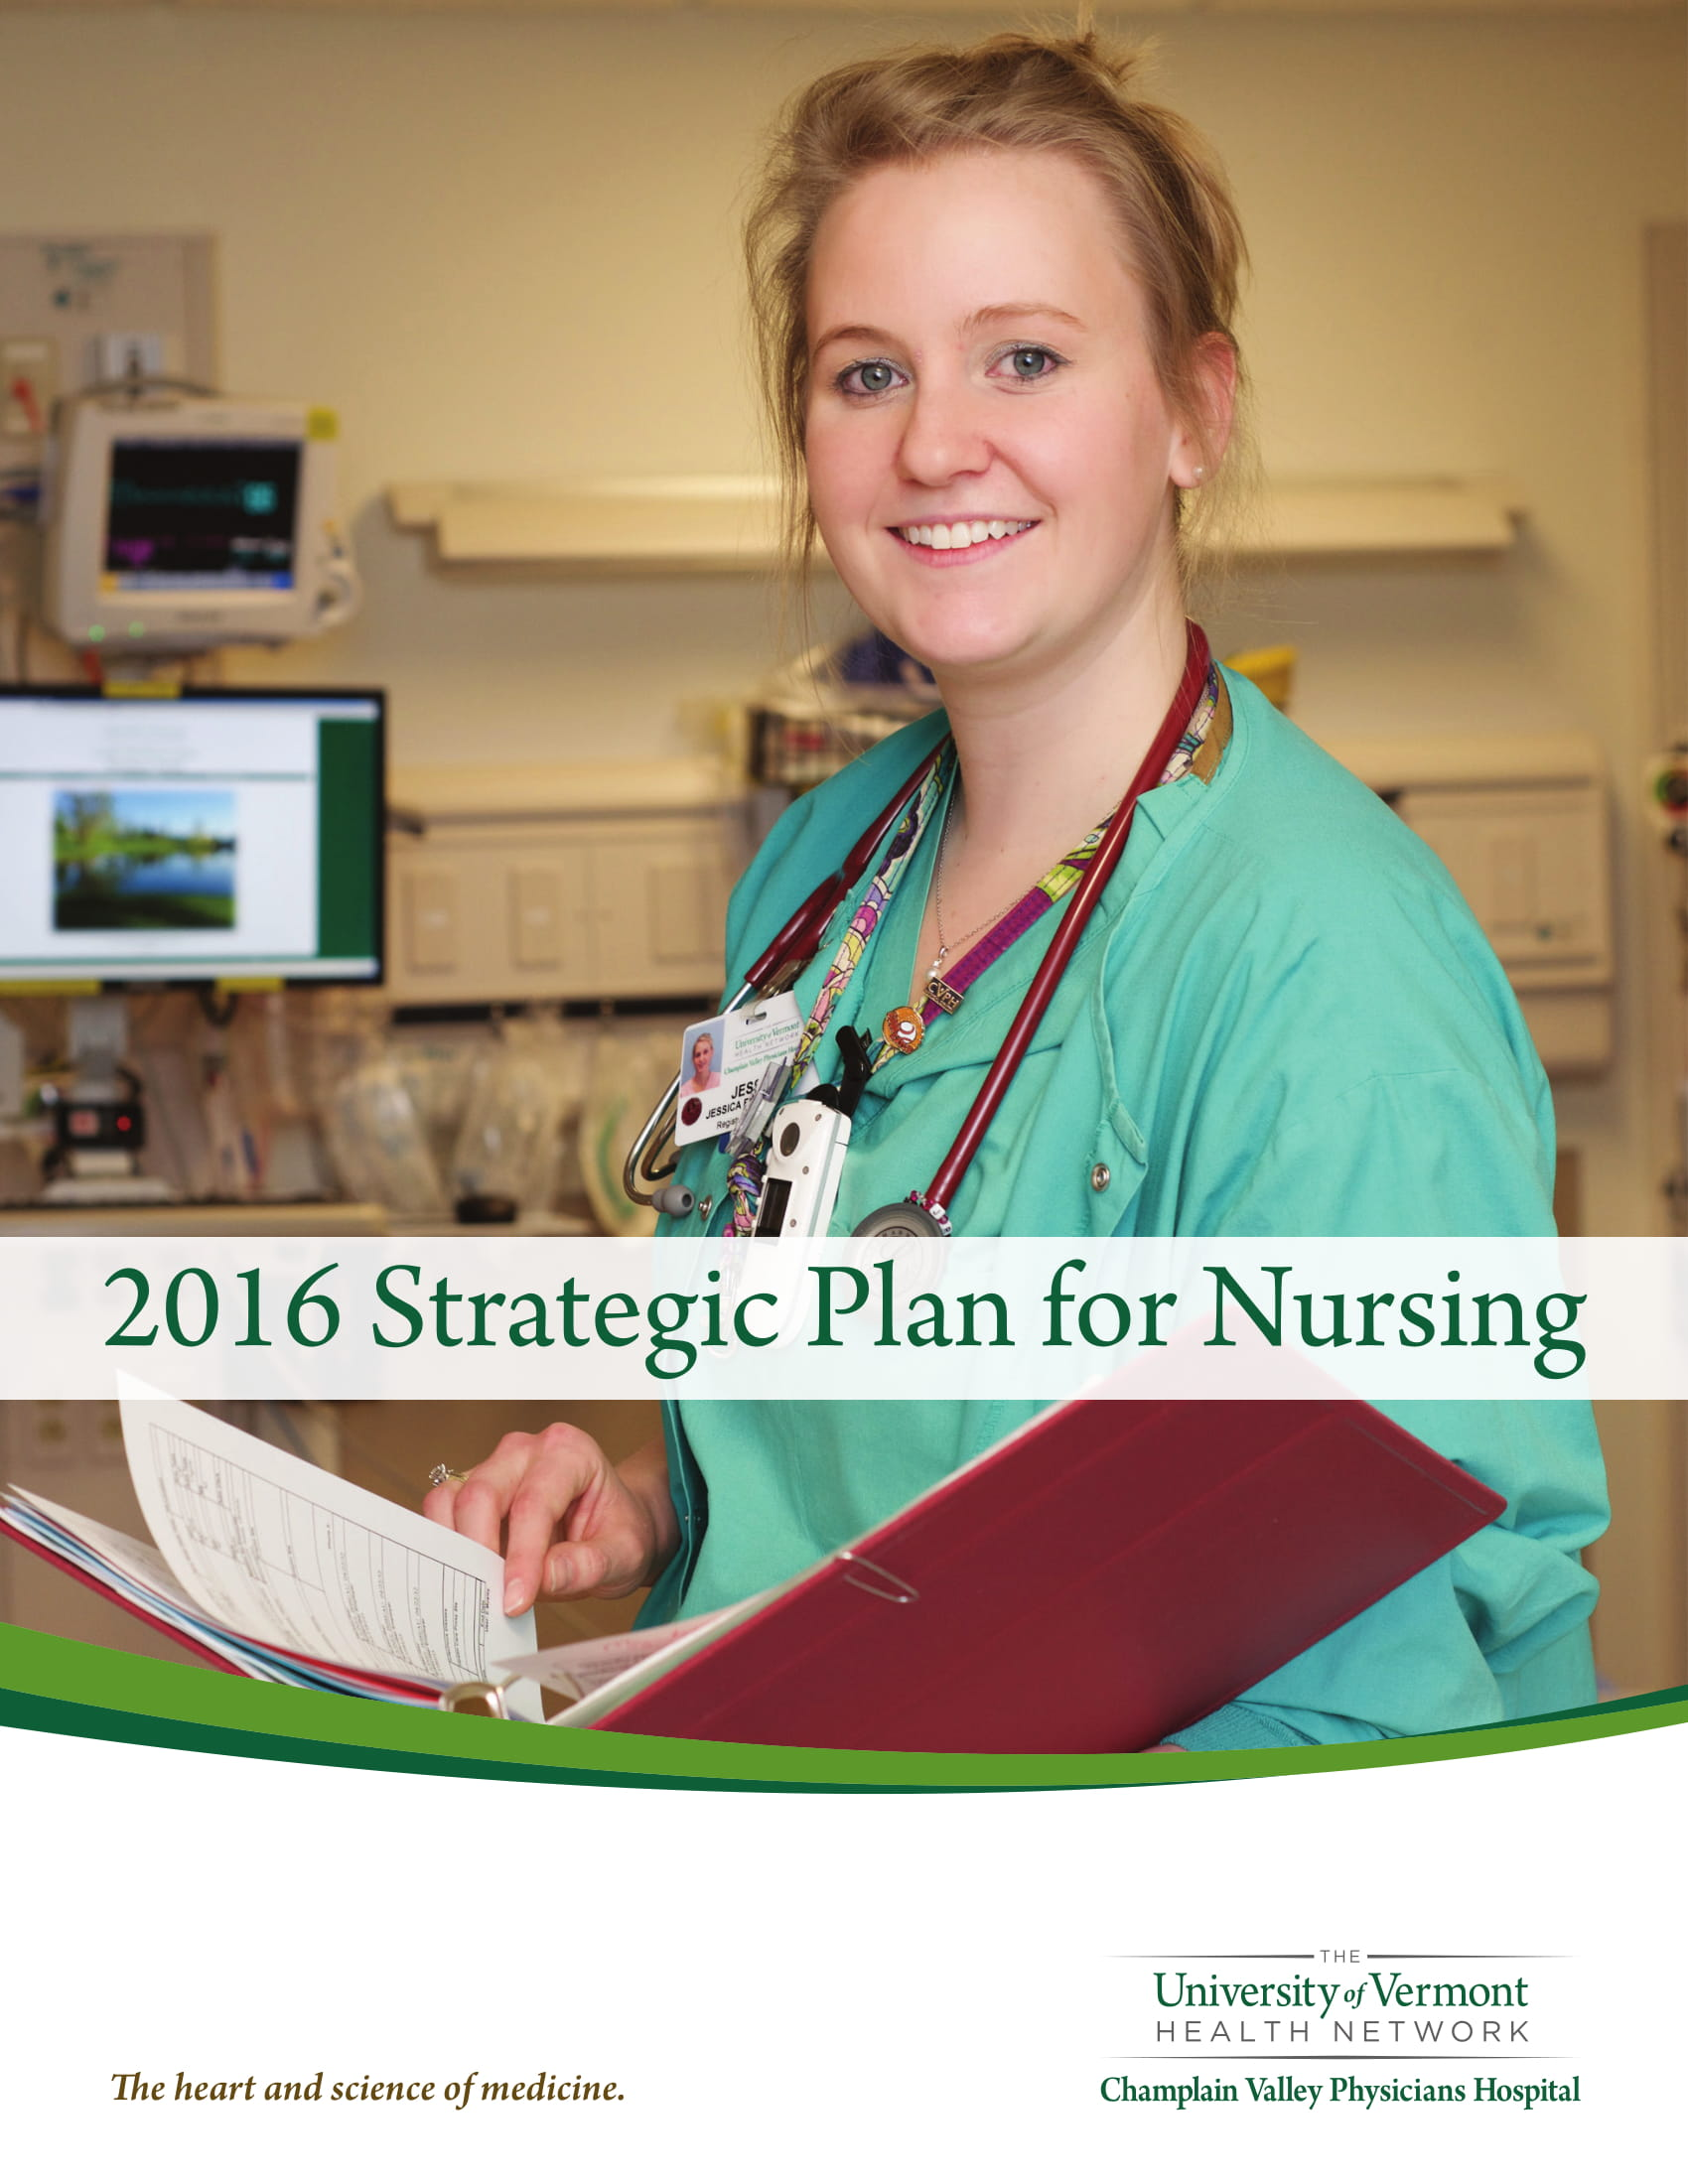 strategic plan for nursing example 01